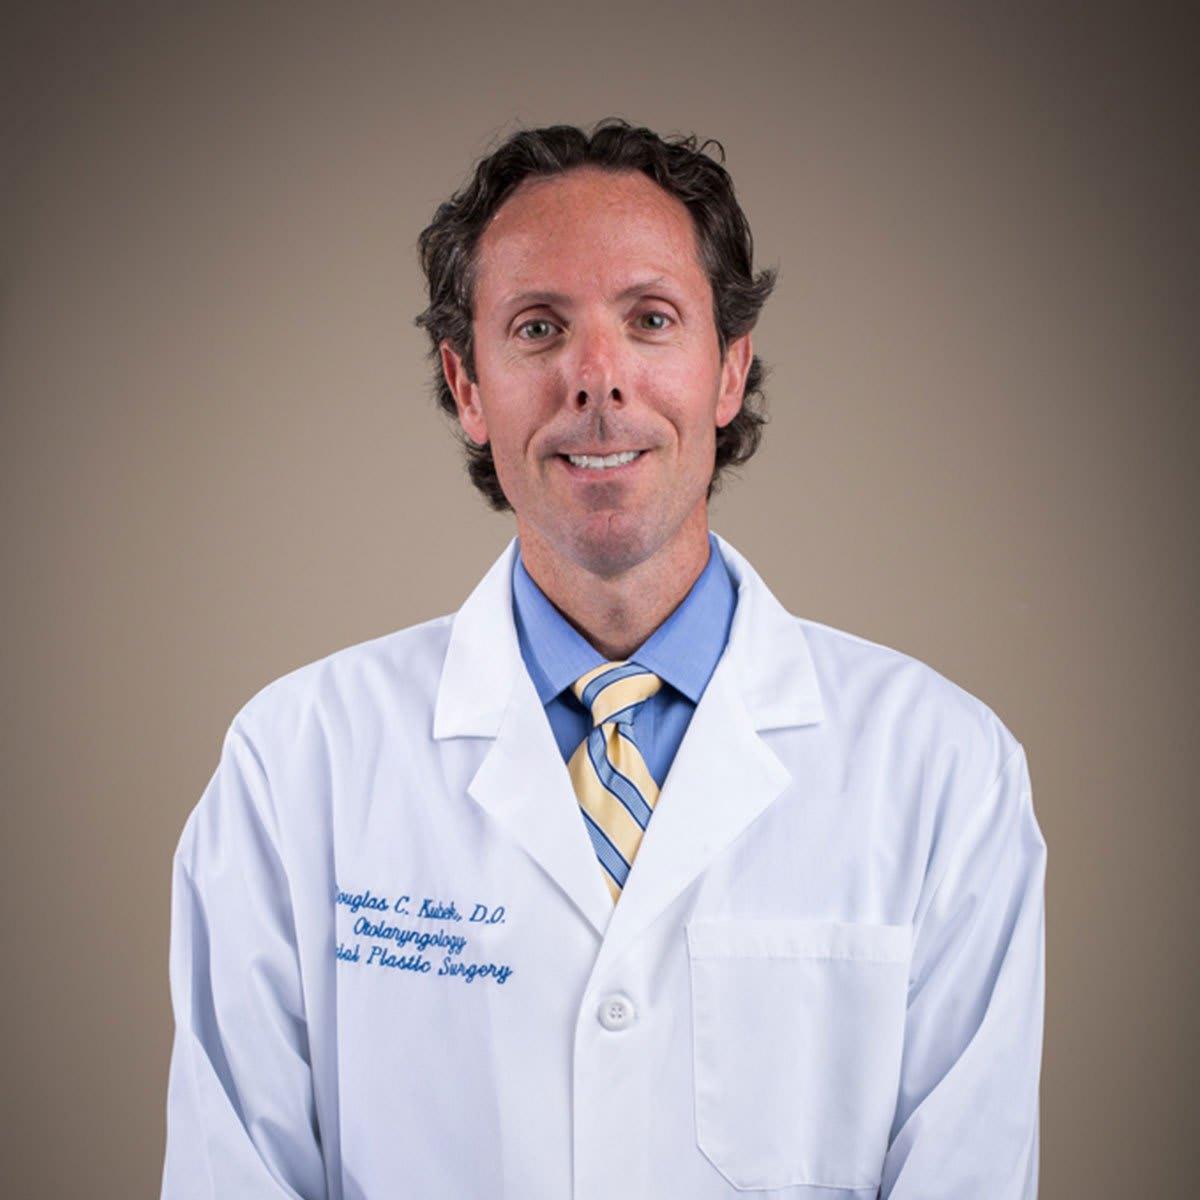 Douglas C Kubek, DO Otolaryngology